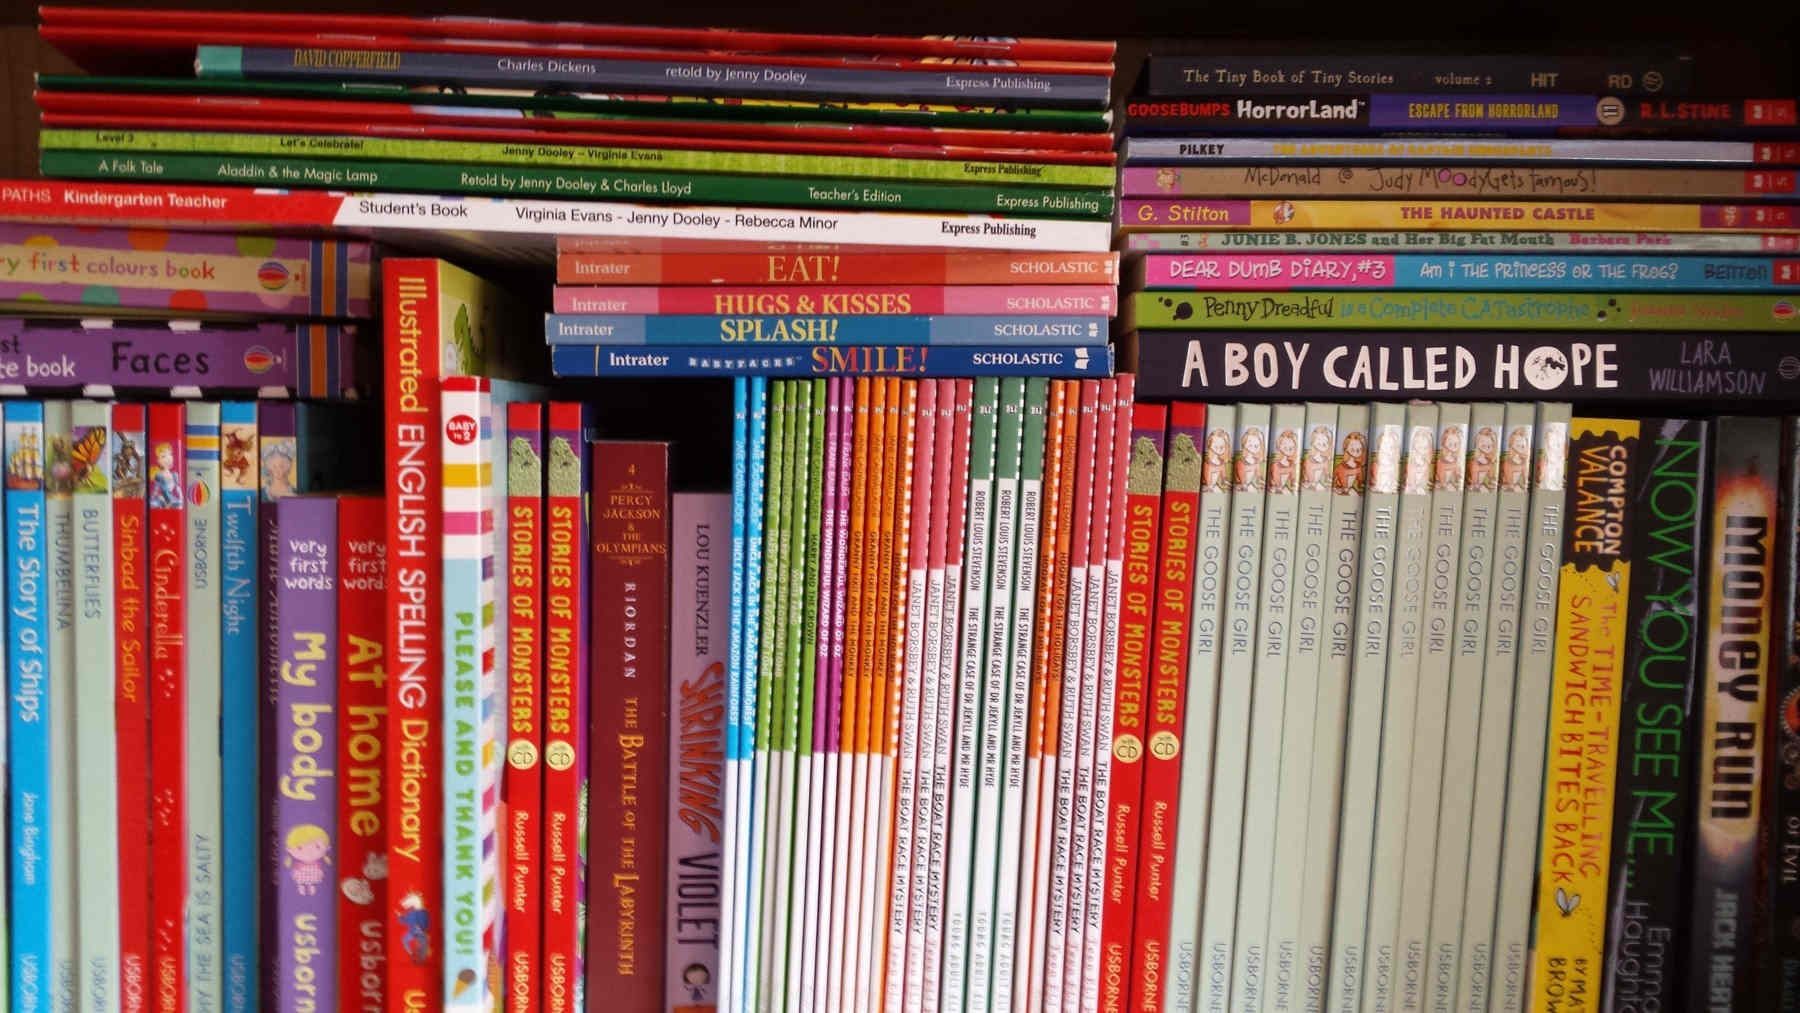 Libros o lecturas en Inglés, francés, alemán, español